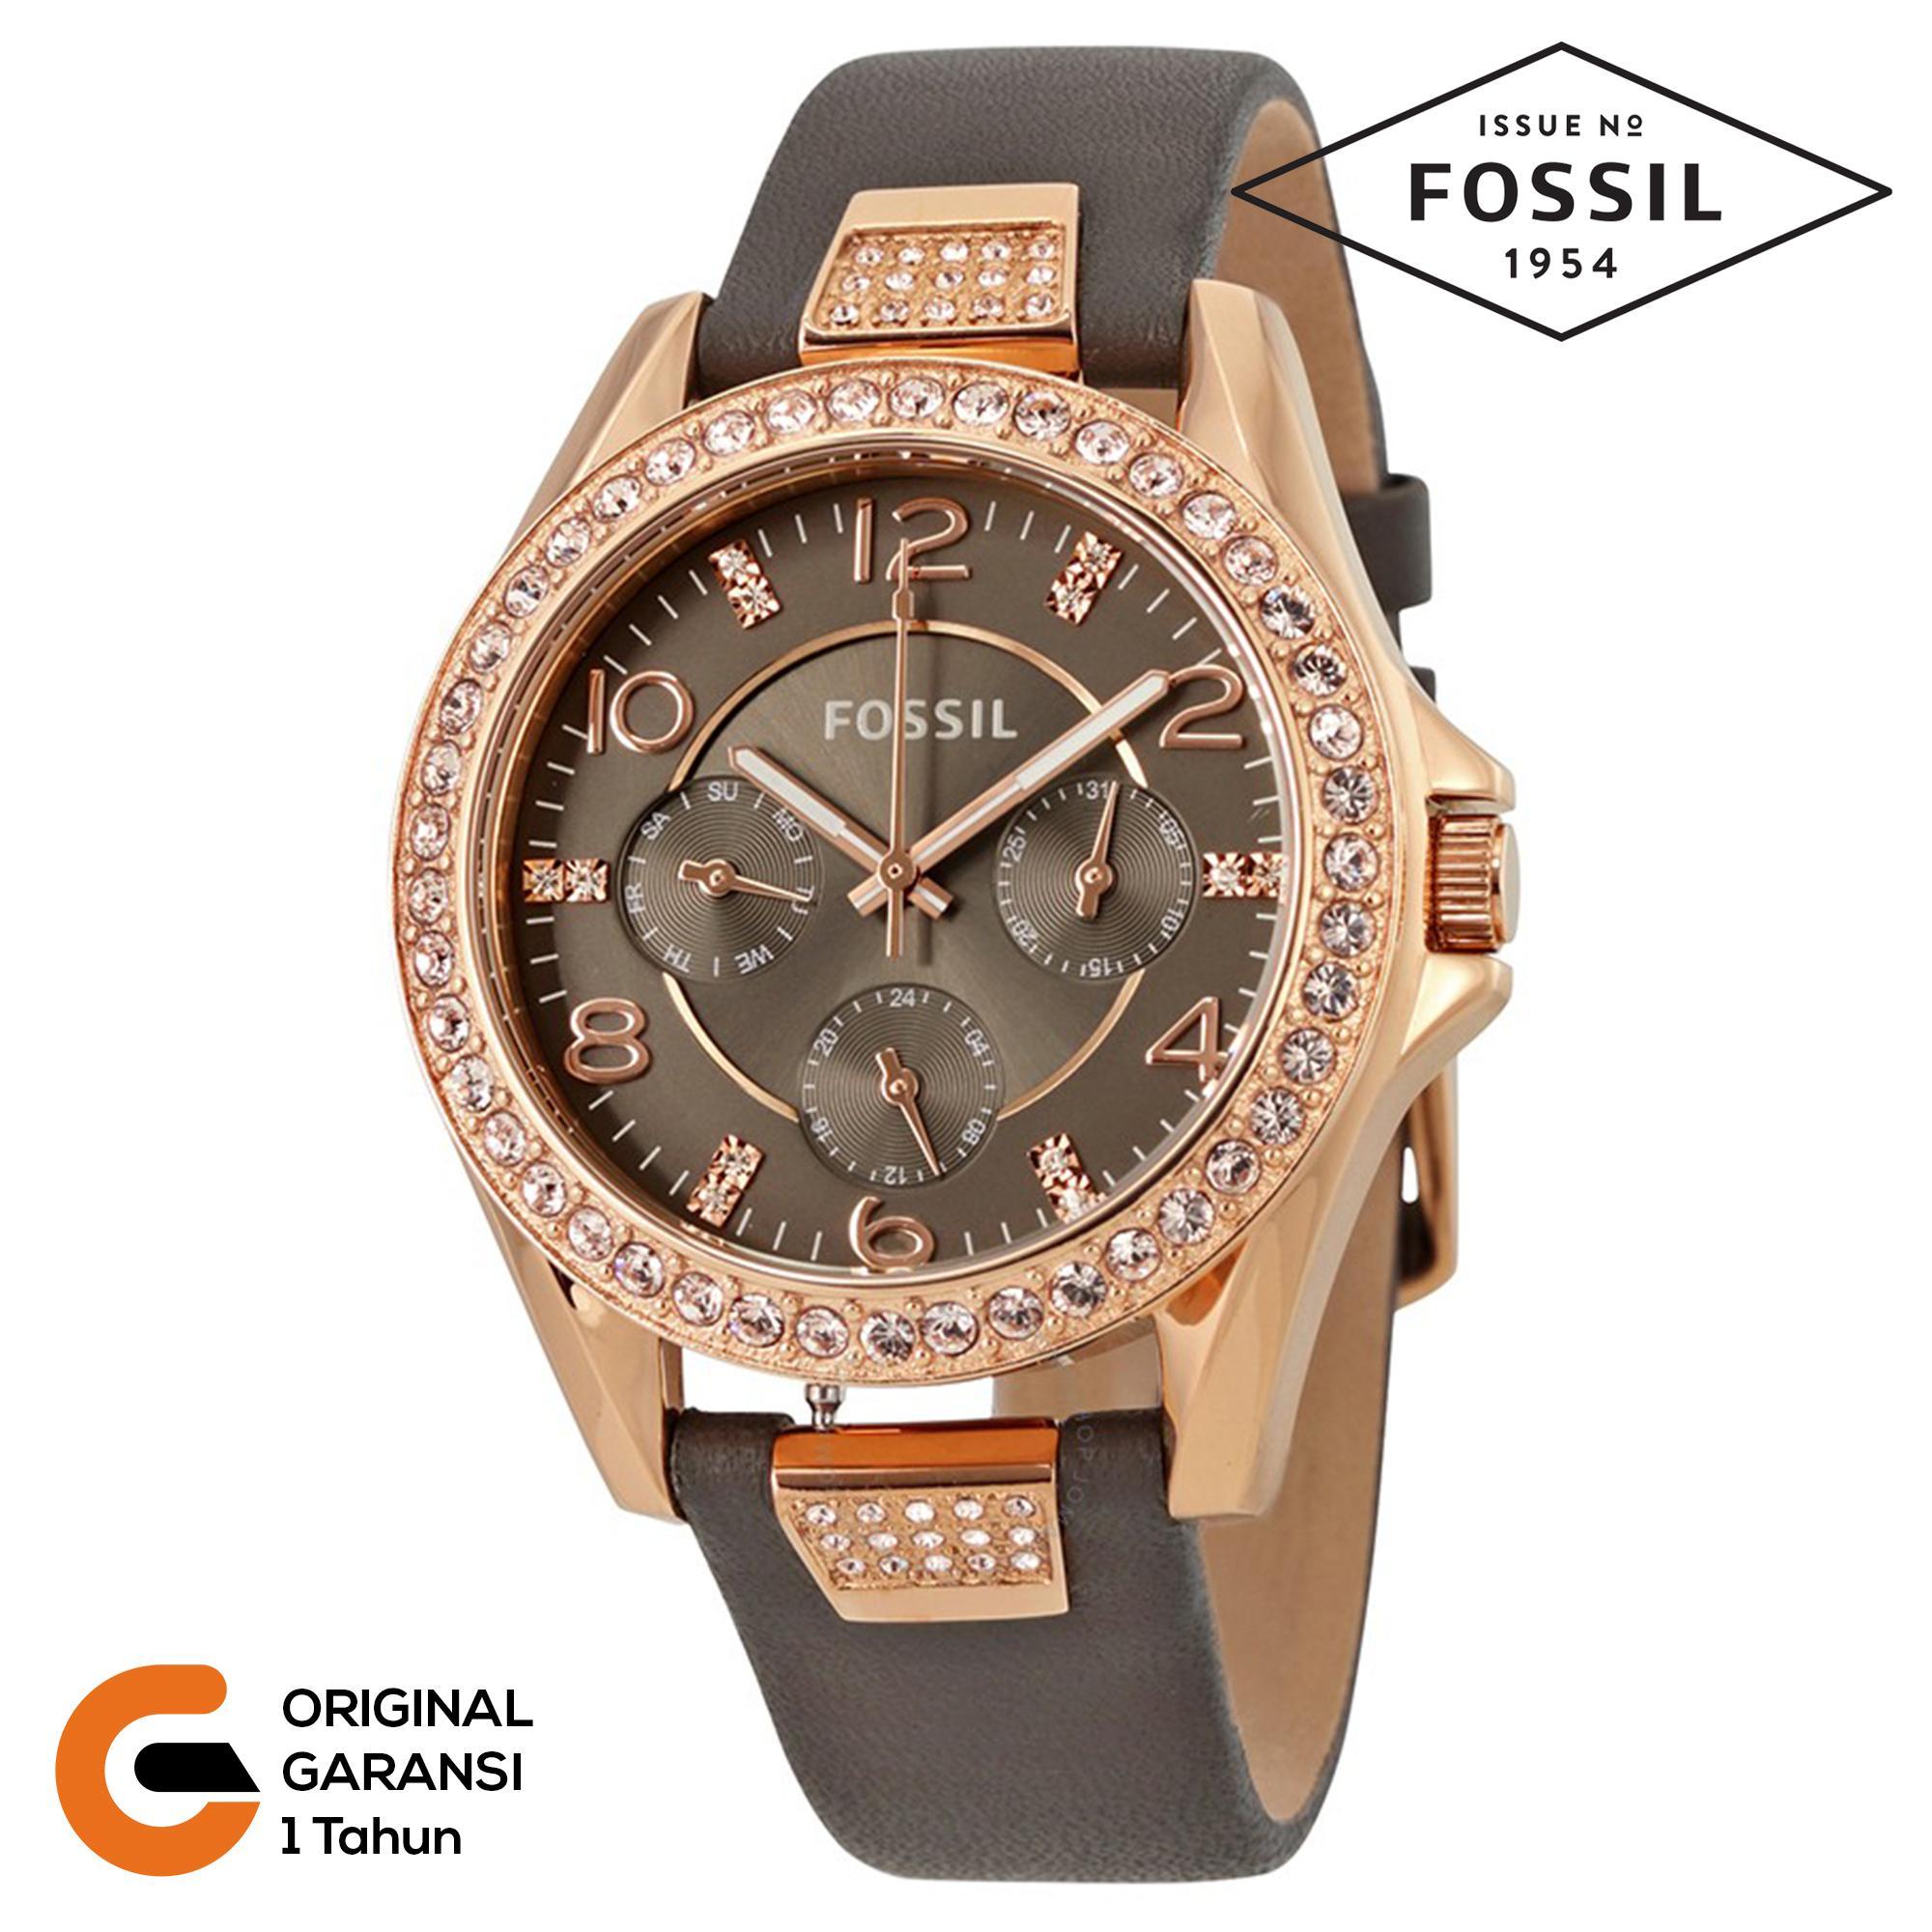 Jam Tangan Fossil Wanita Original Es3712 Analog Tali Kulit Leather Strap Quartz Movement Es3887 Es3888